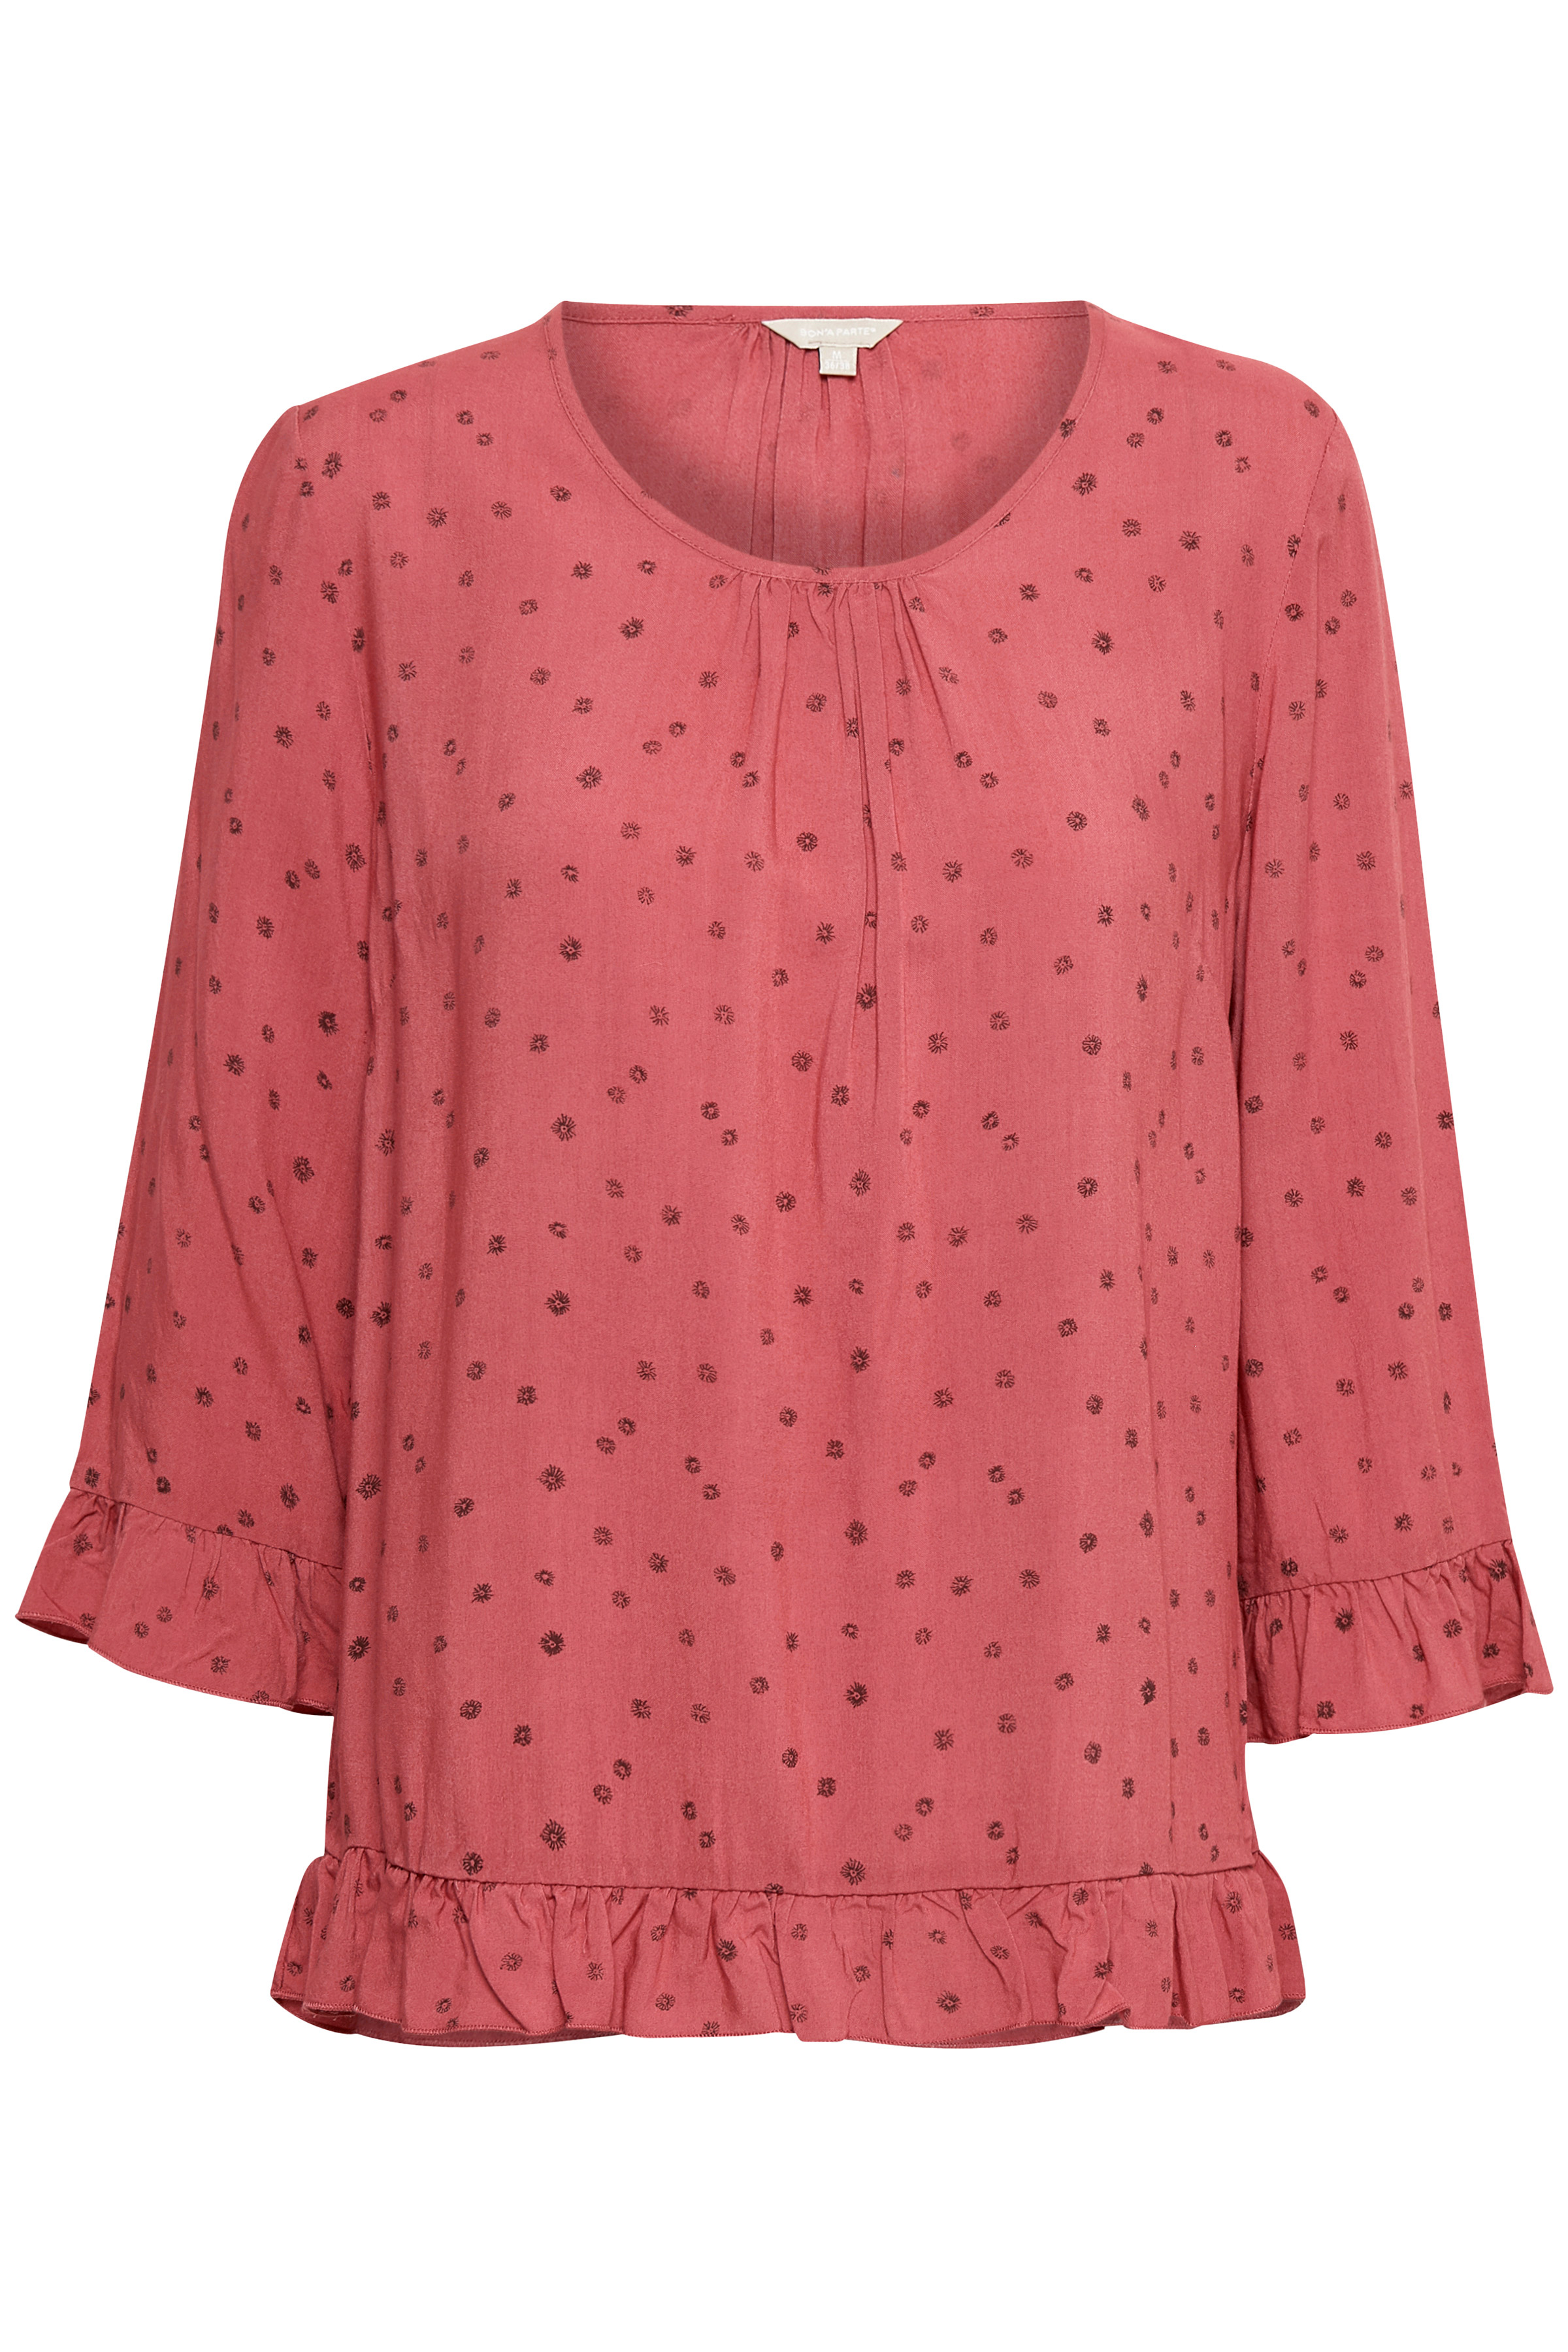 Image of BonA Parte Dame Fin Heshu bluse - Antik rosa